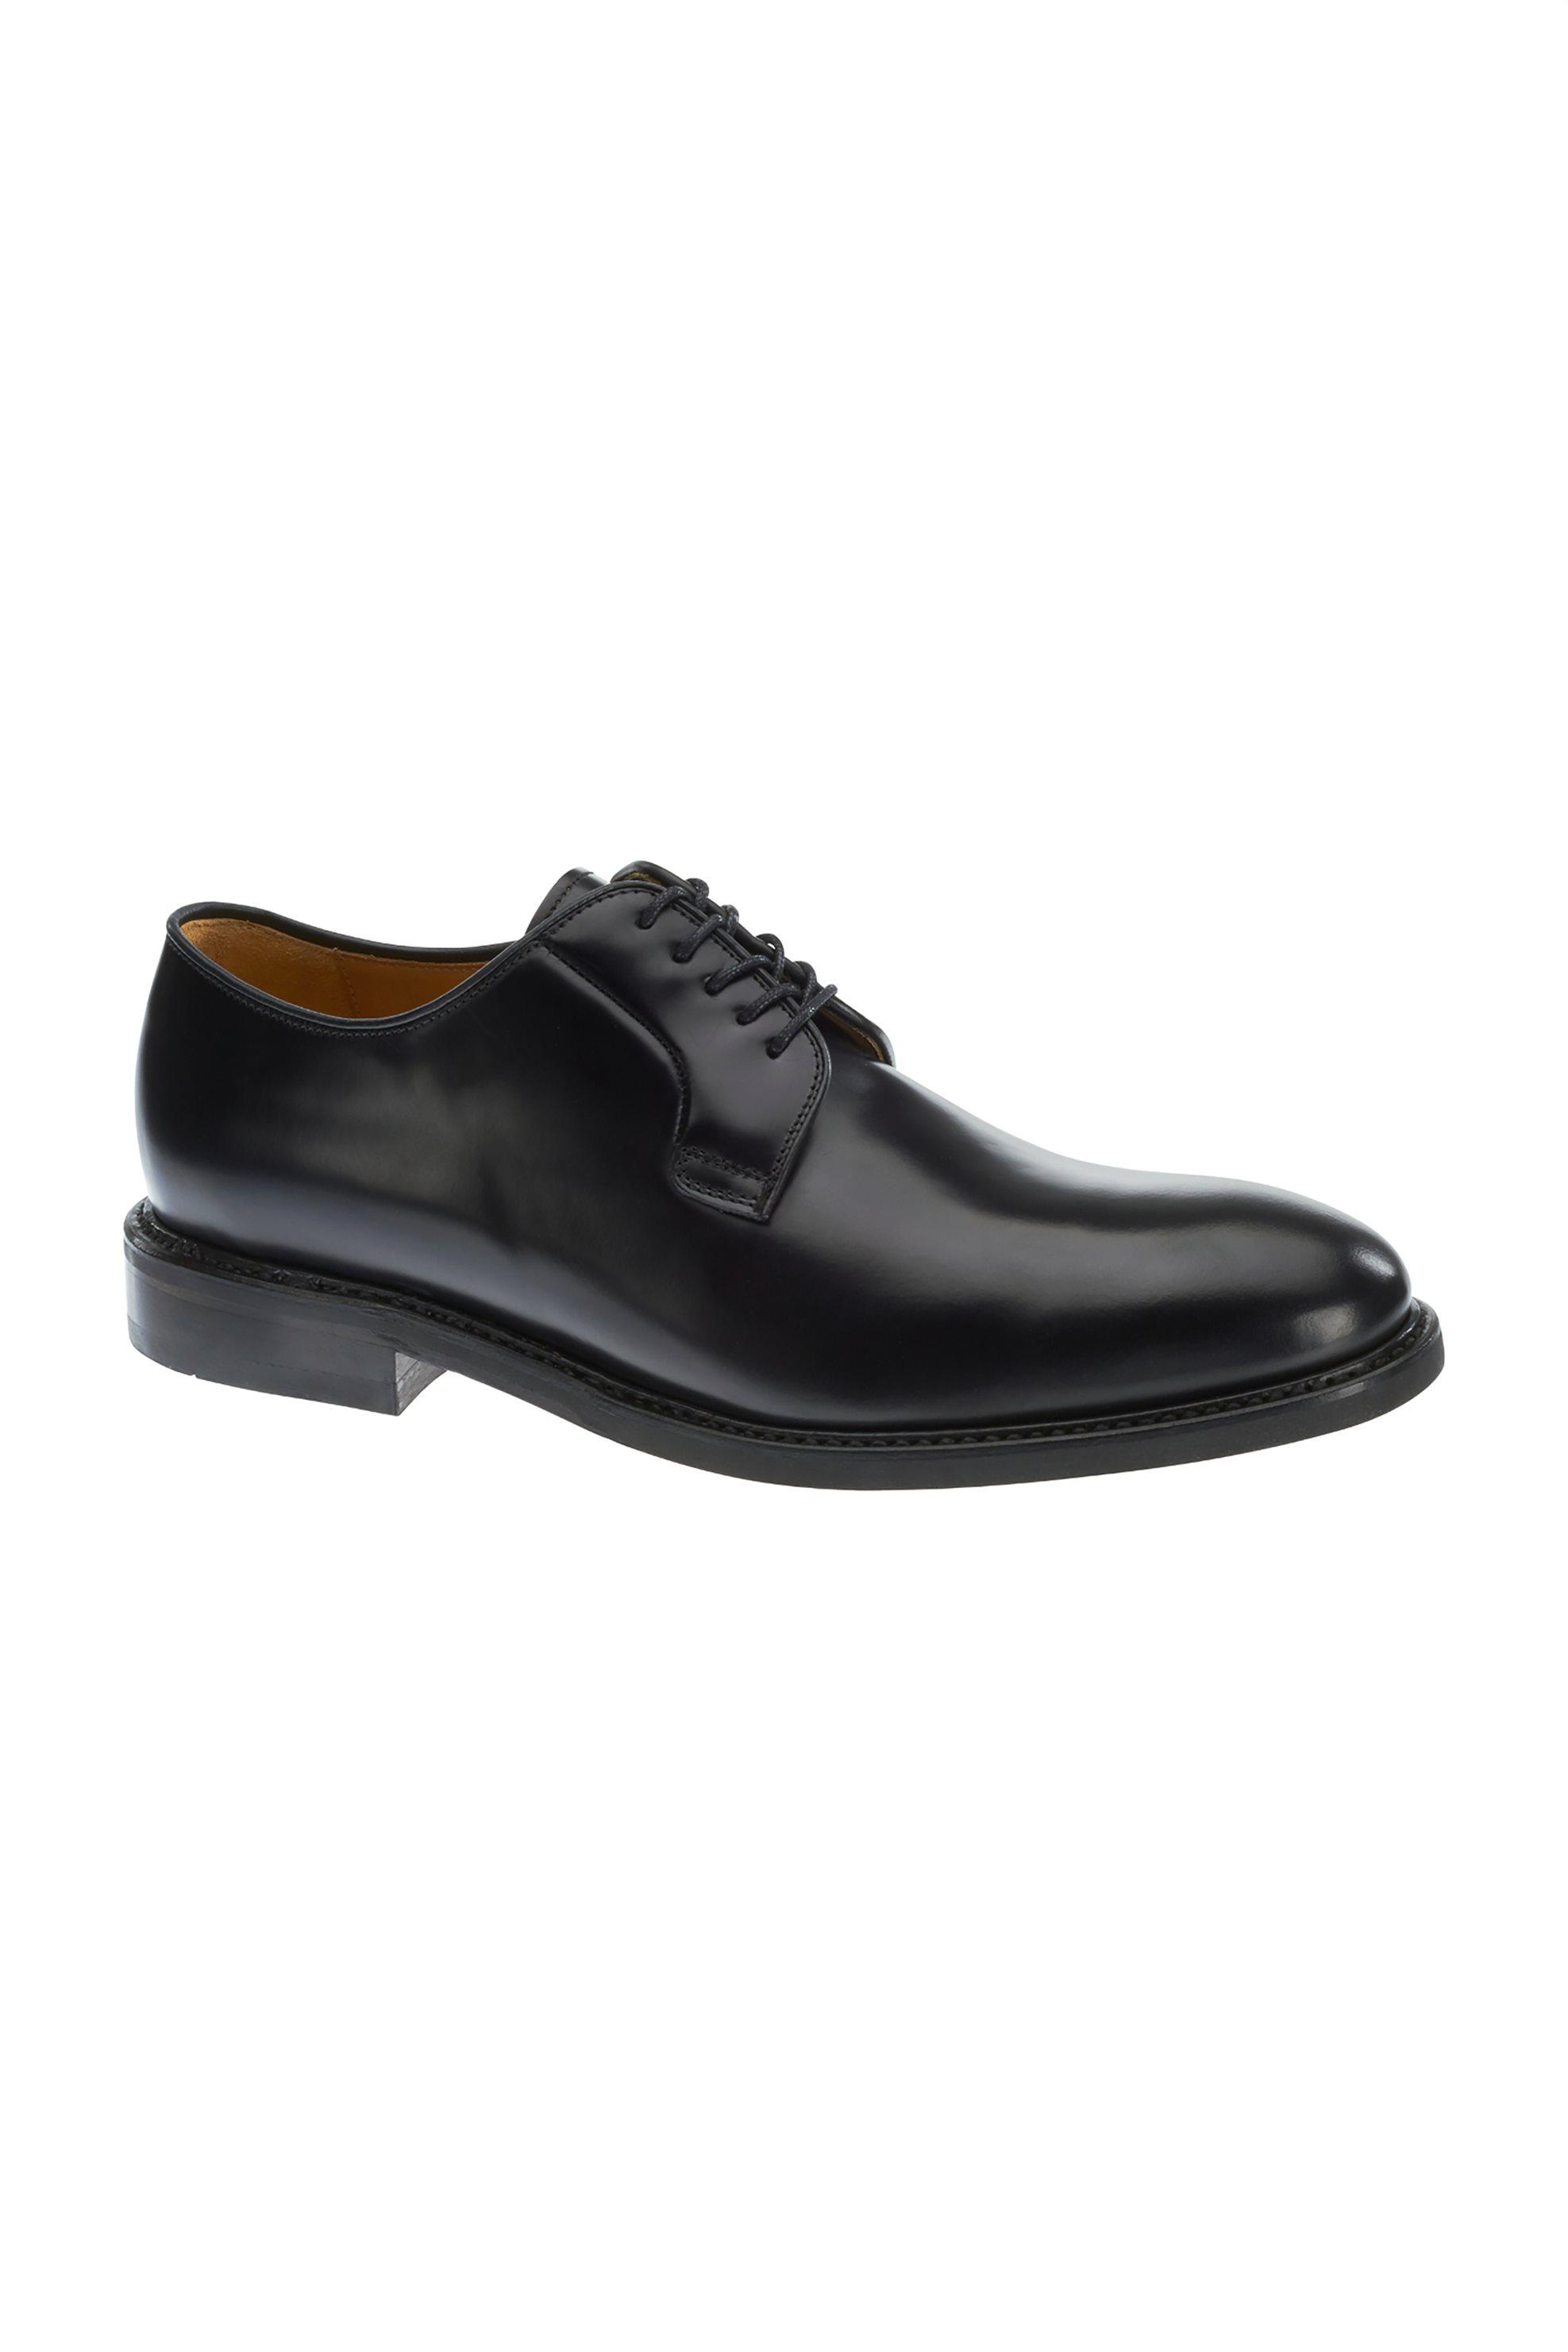 Notos Sebago ανδρικά παπούτσια δερμάτινα με κορδόνια Cordoba – B220025 –  Μαύρο 7d22aac1fa1